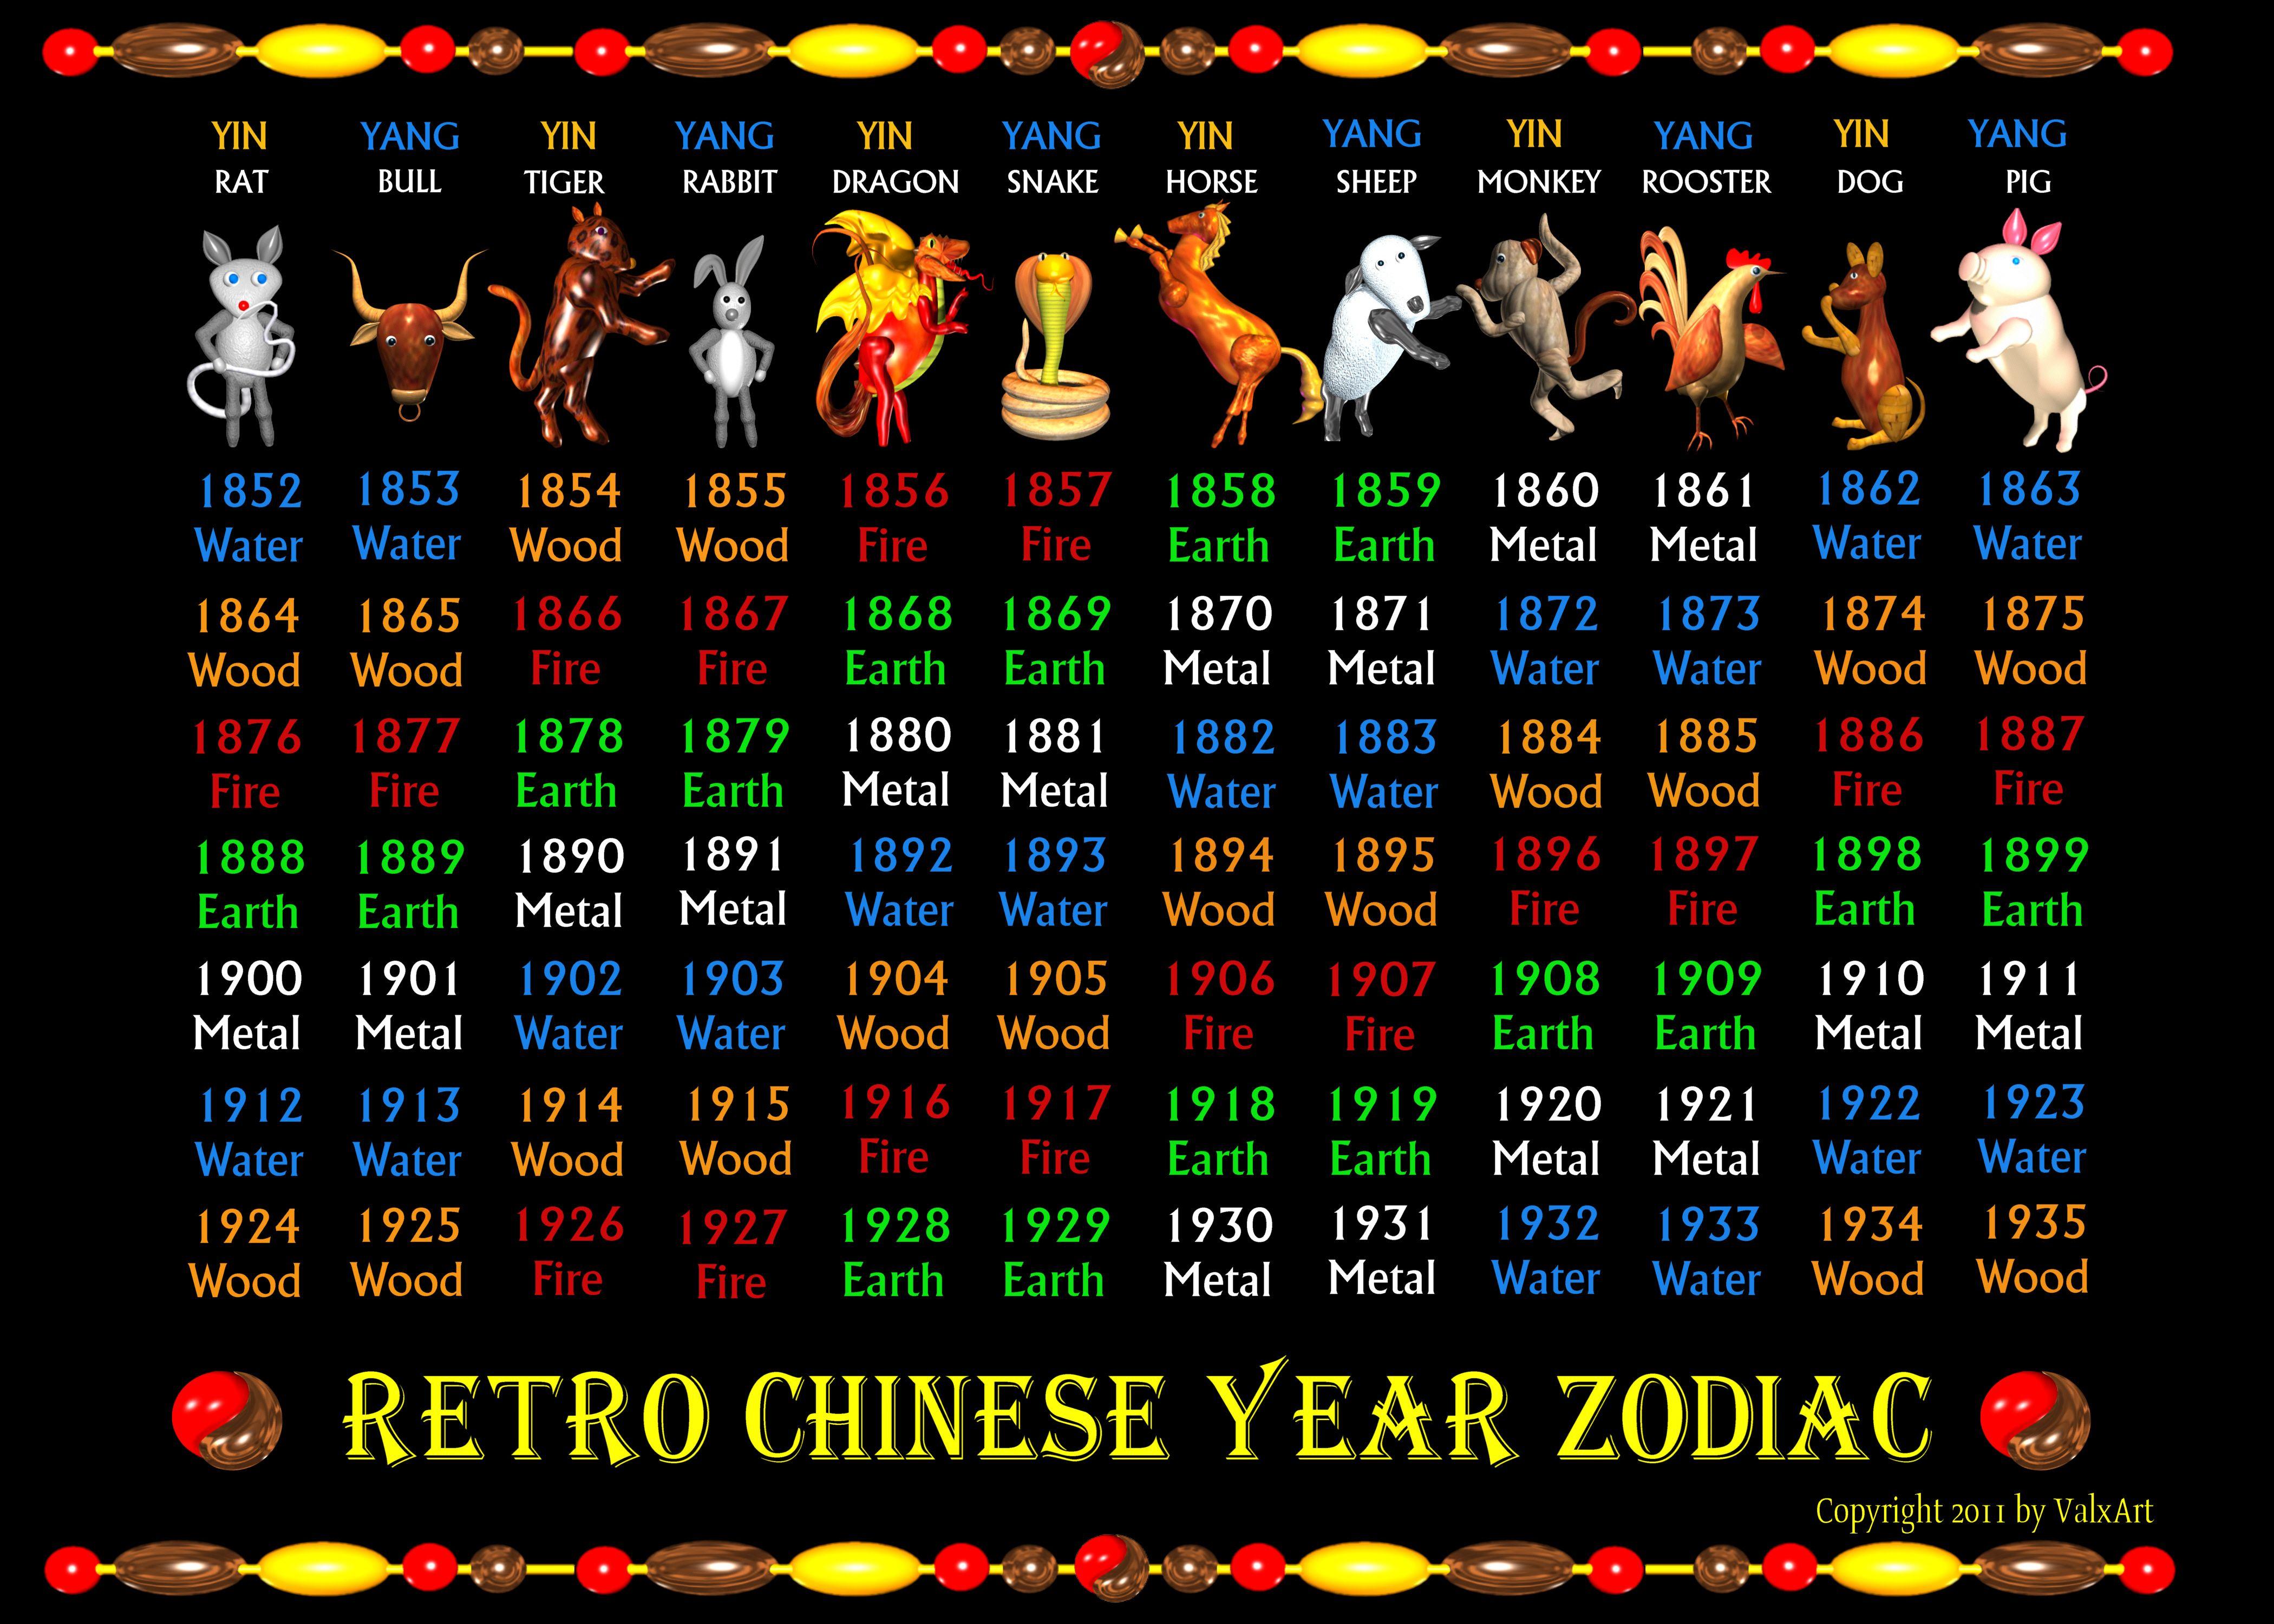 Retro Chinese Zodiac Poster Years 1852 To 1935 | Zazzle